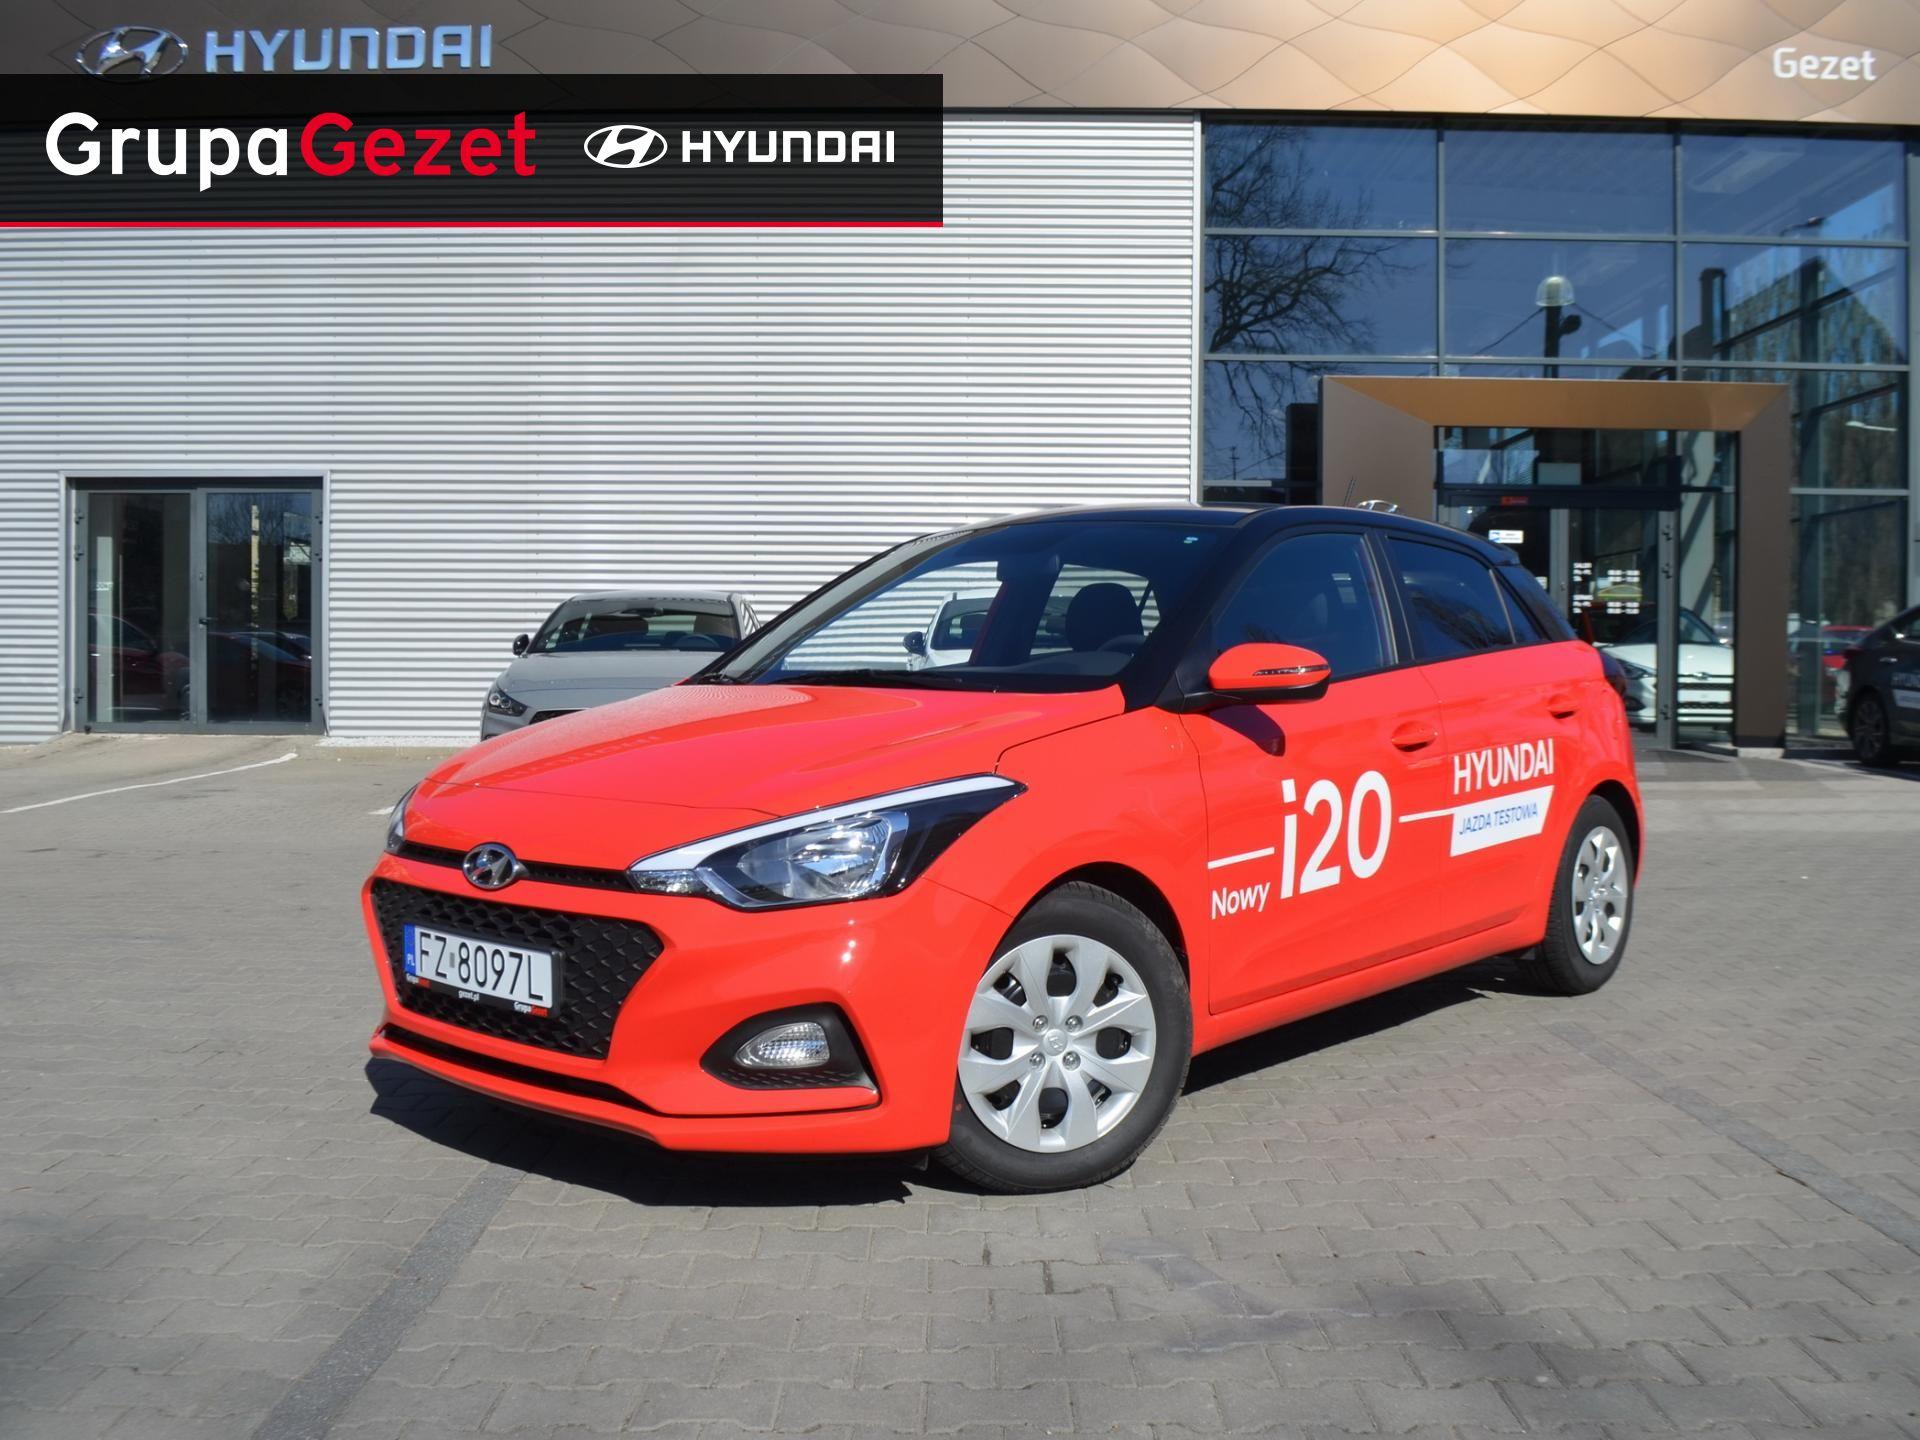 Bardzo dobryFantastyczny Hyundai i20 GET! 1,2 MPI 84KM | Kolor: Czerwony ✰ Samochody JG28